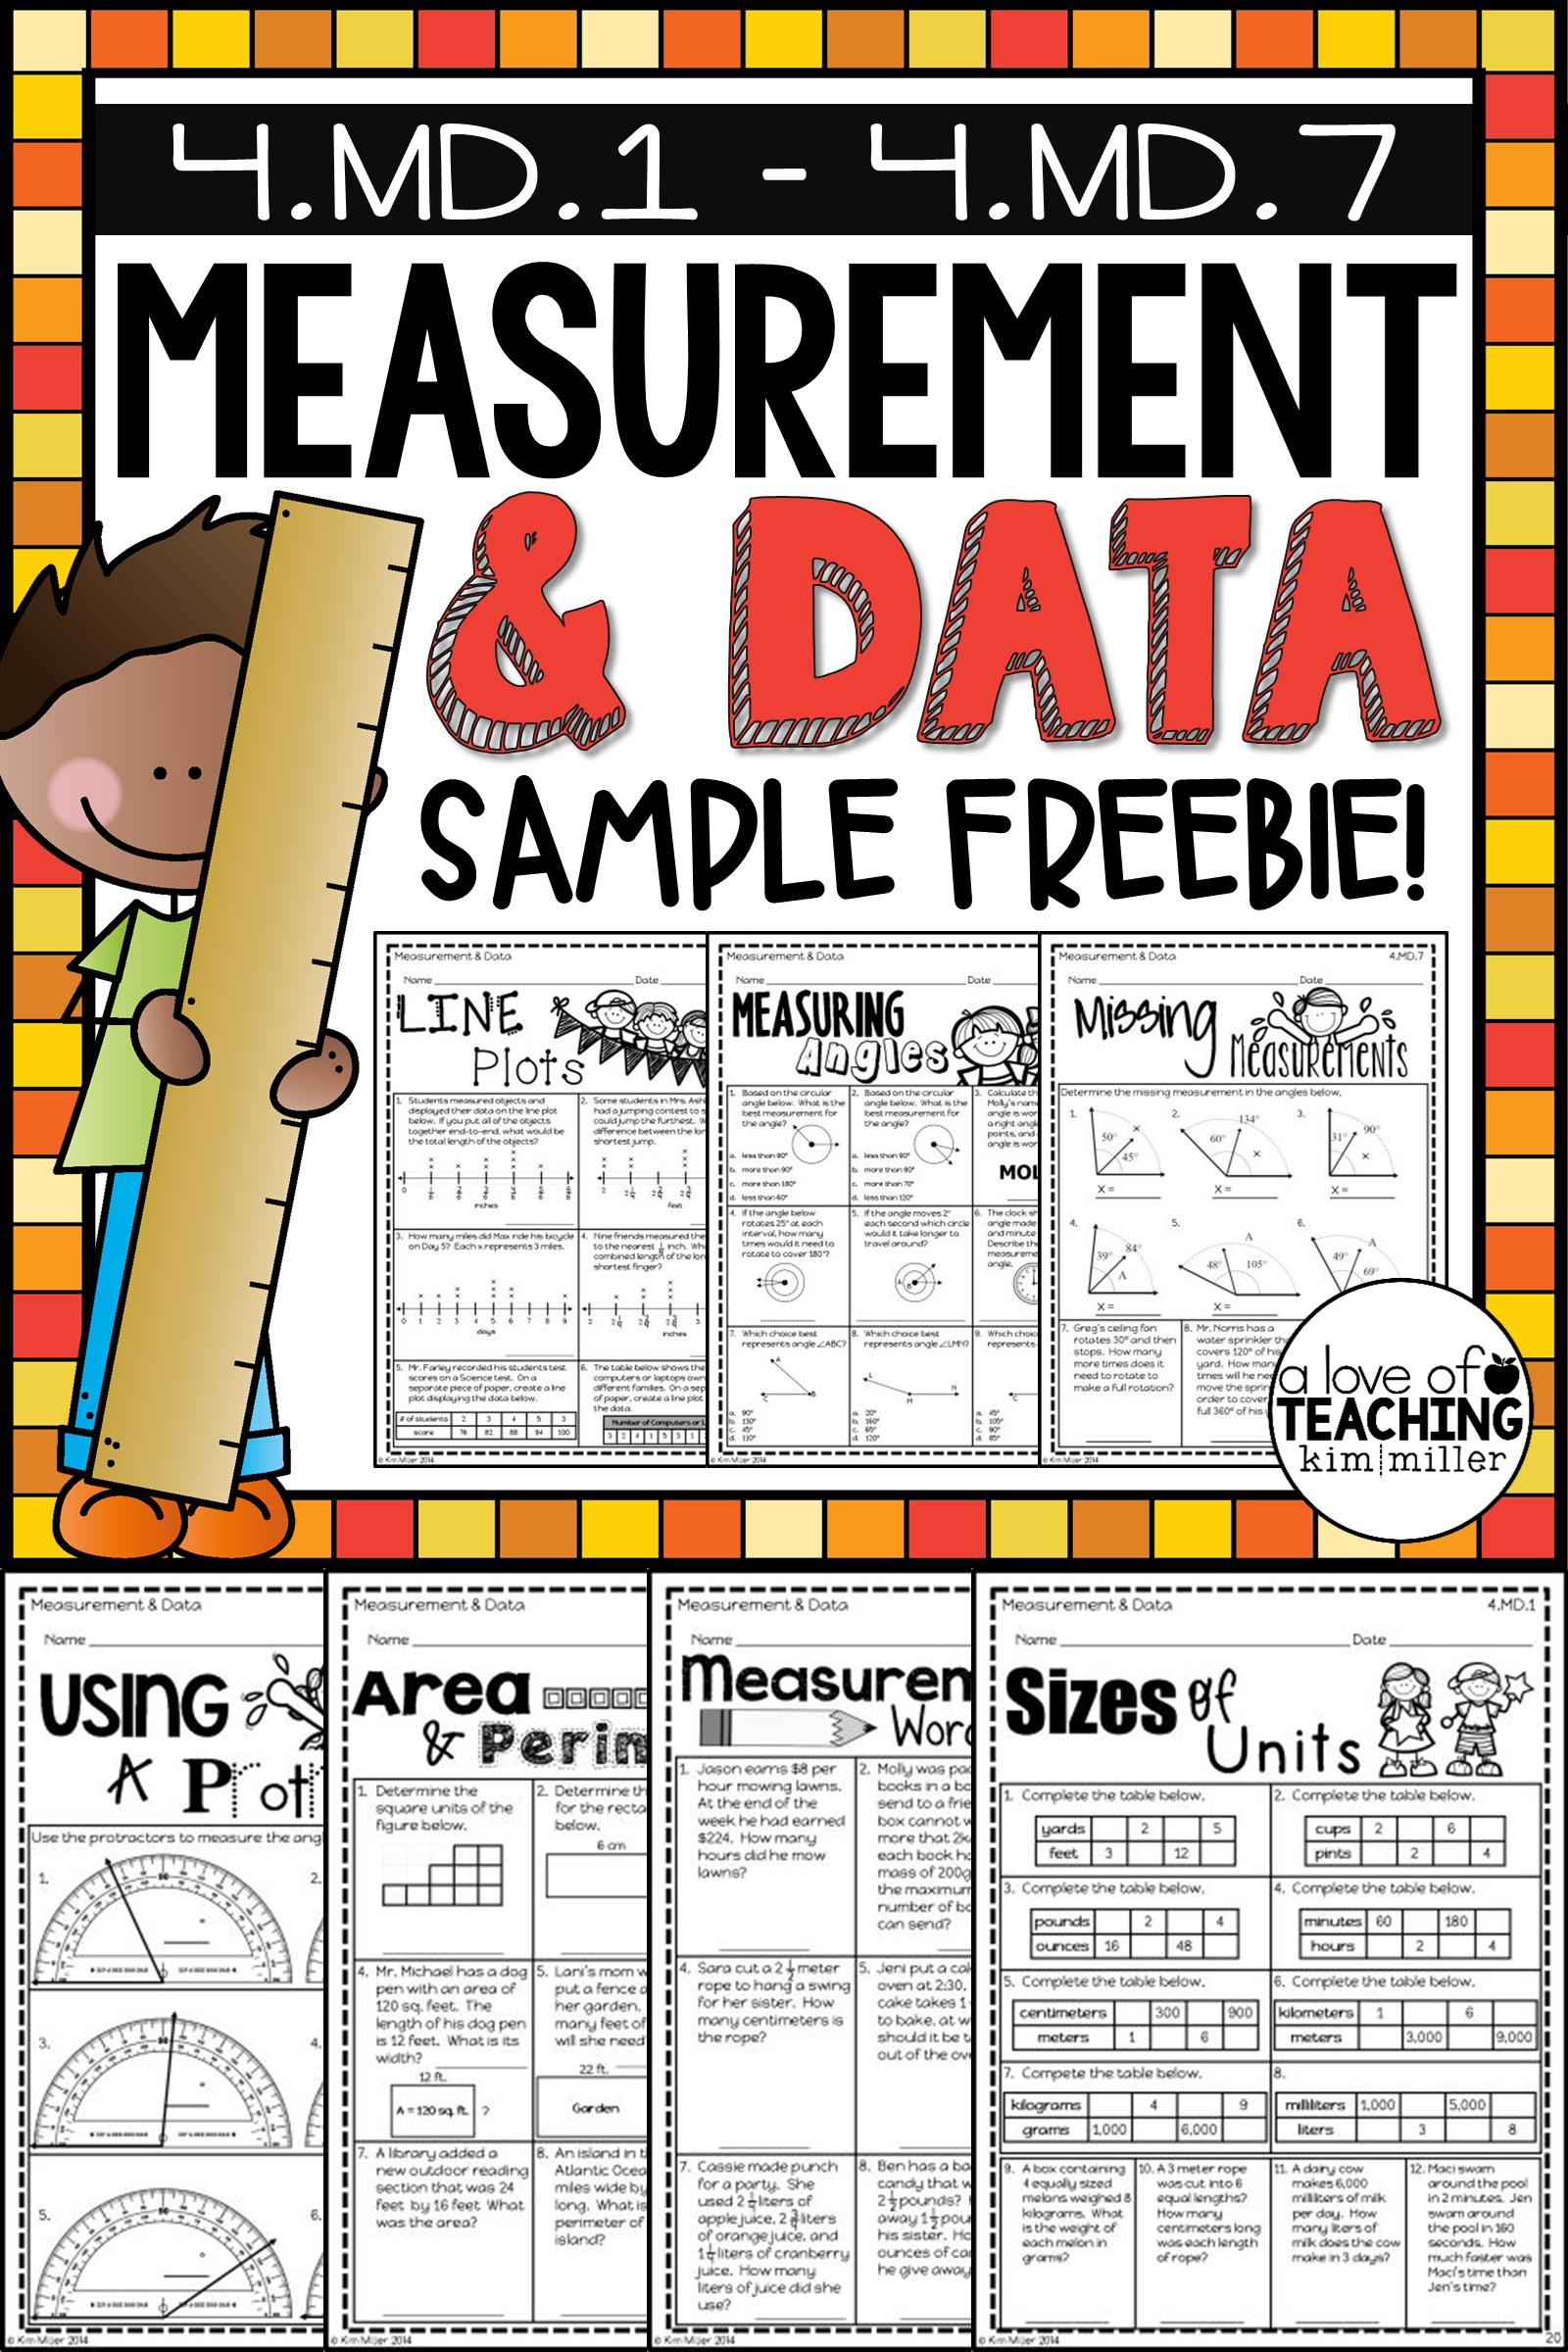 Math Test Prep Review Measurement Angles Line Plots